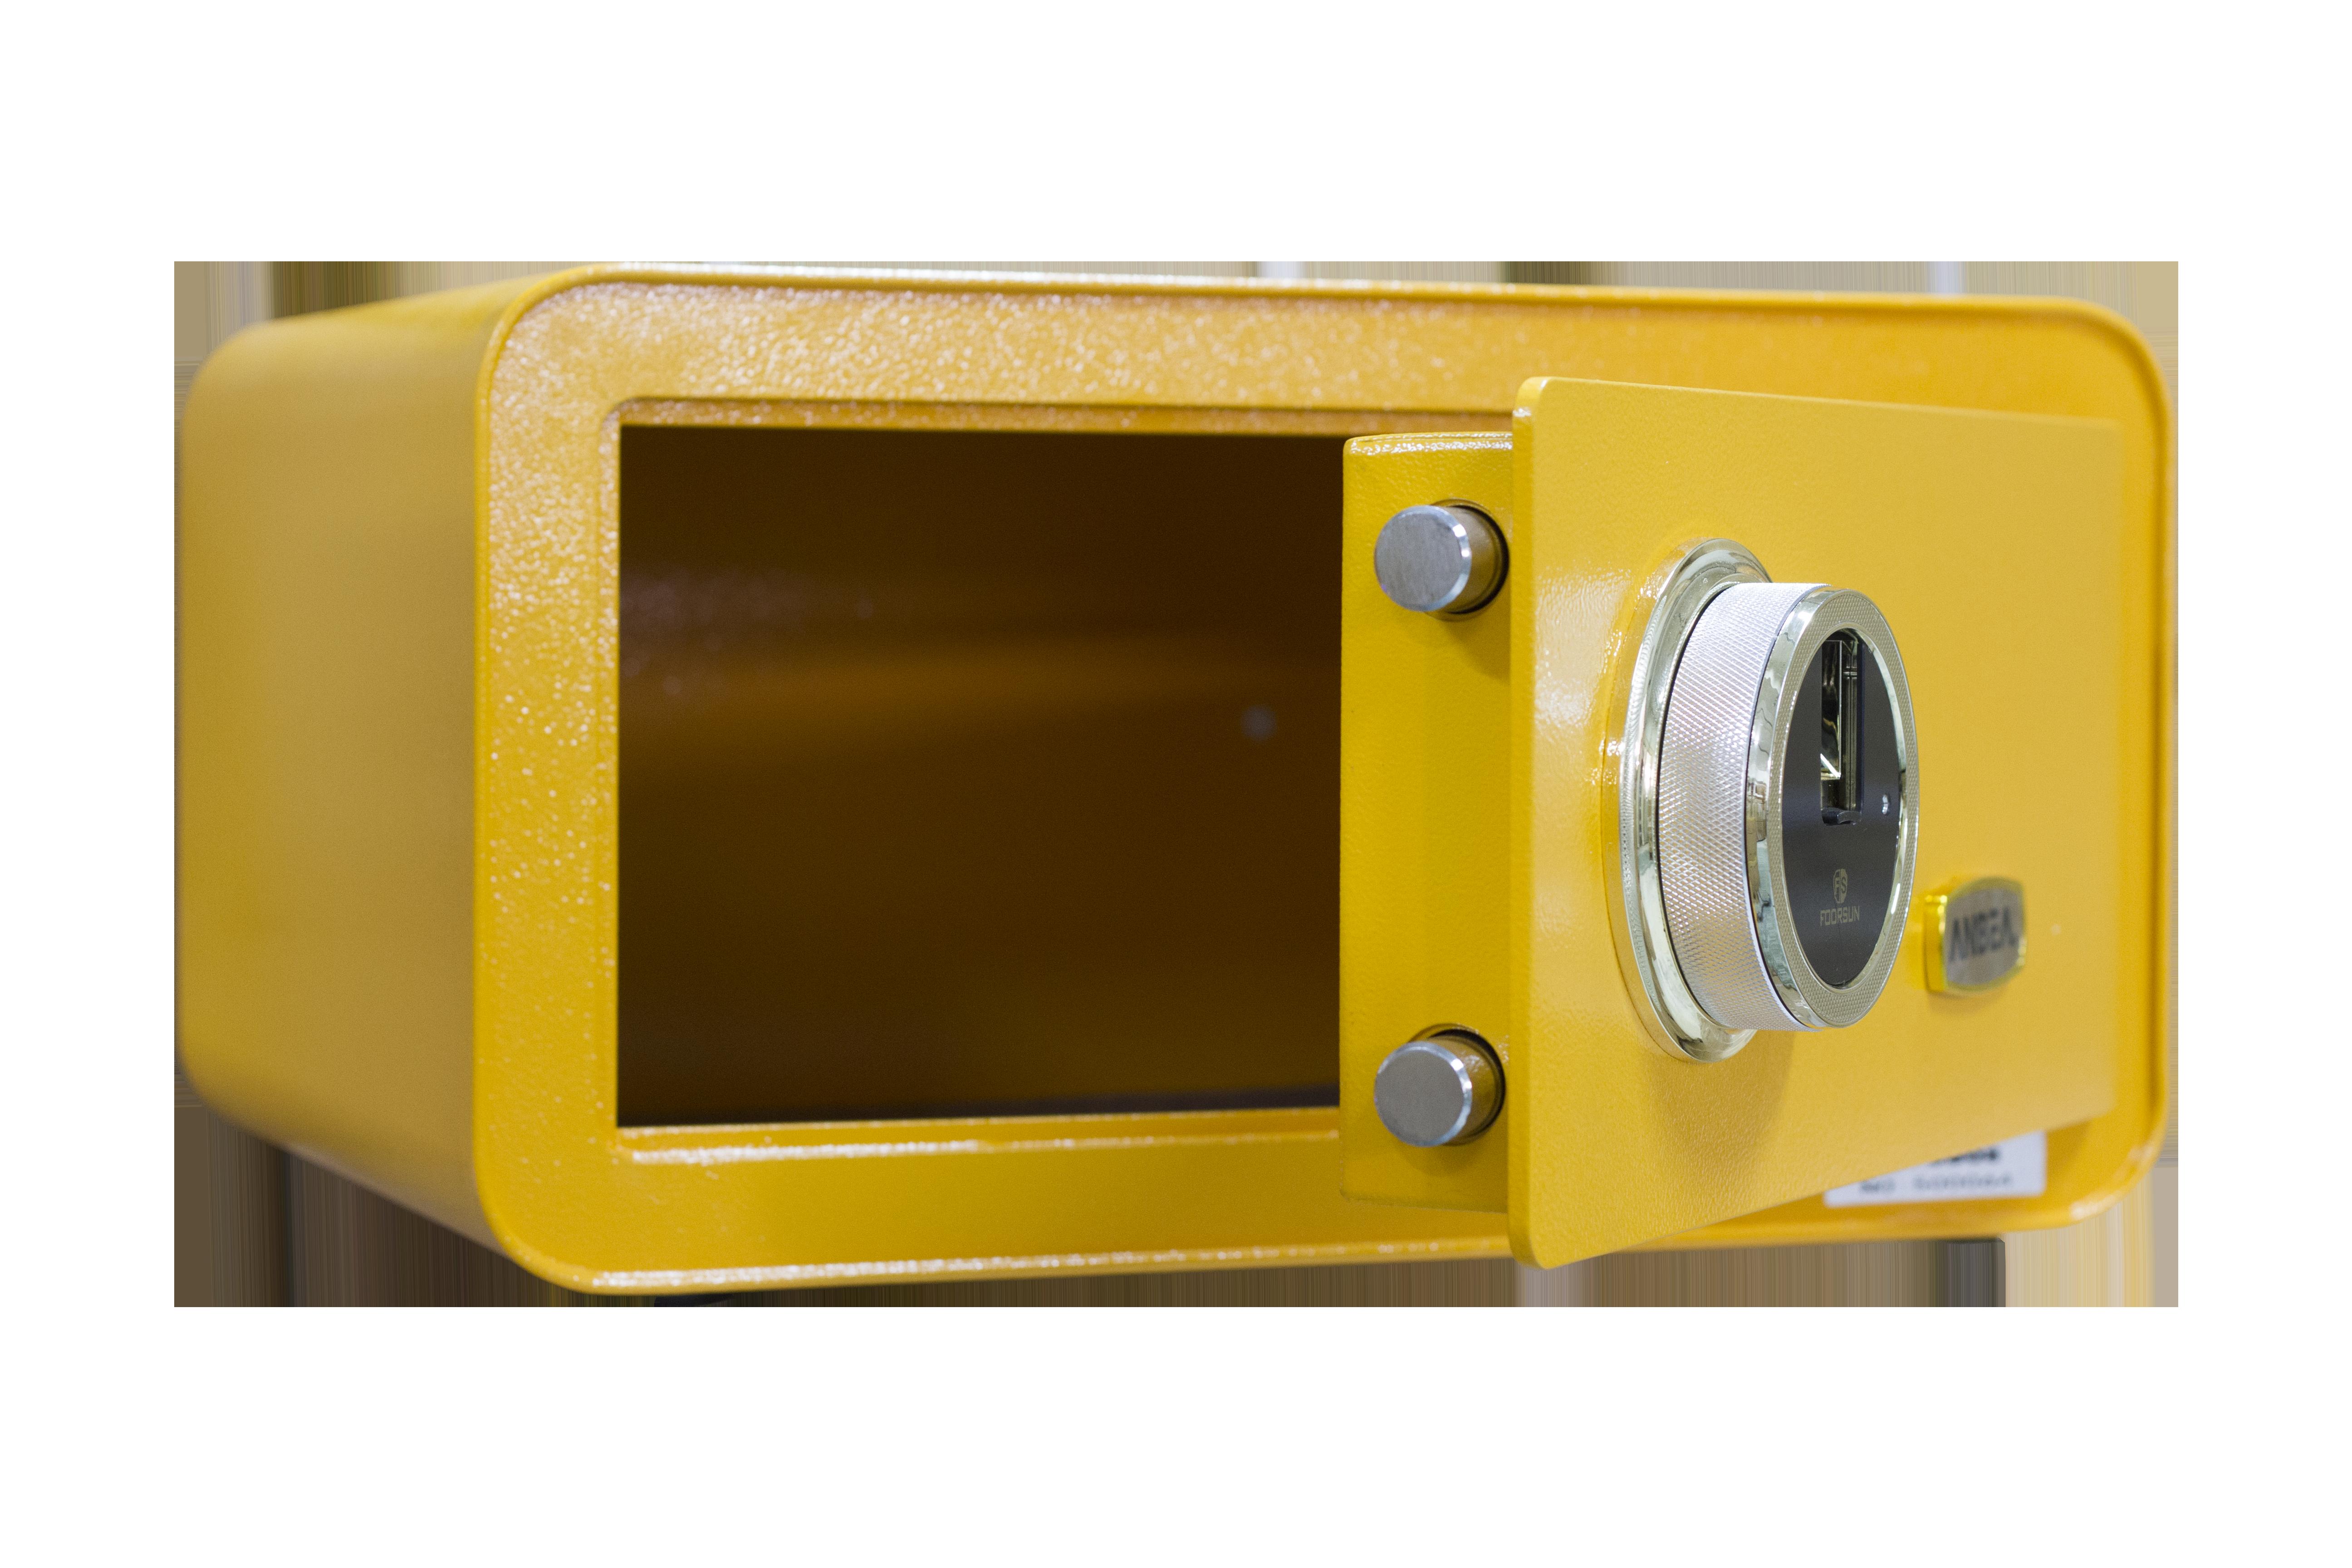 YK-8808時尚指紋保險箱